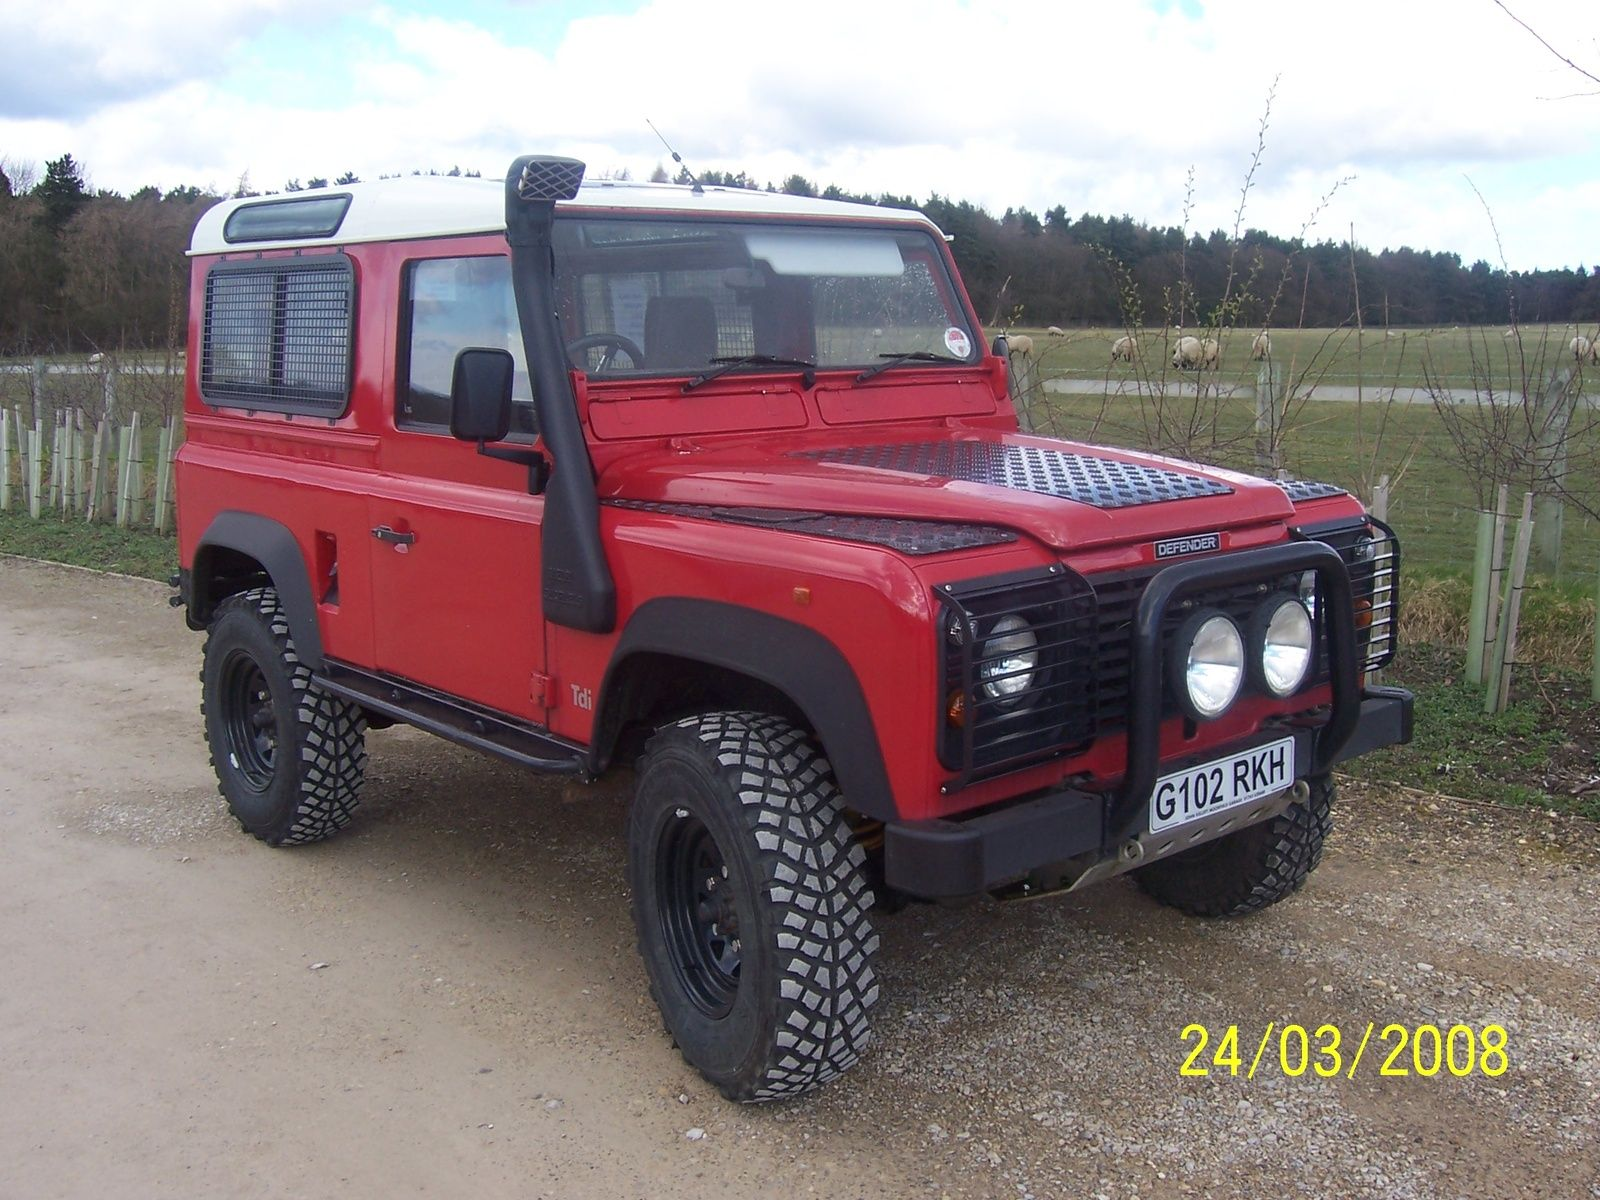 1990 Land Rover Defender Land rover defender, Land rover